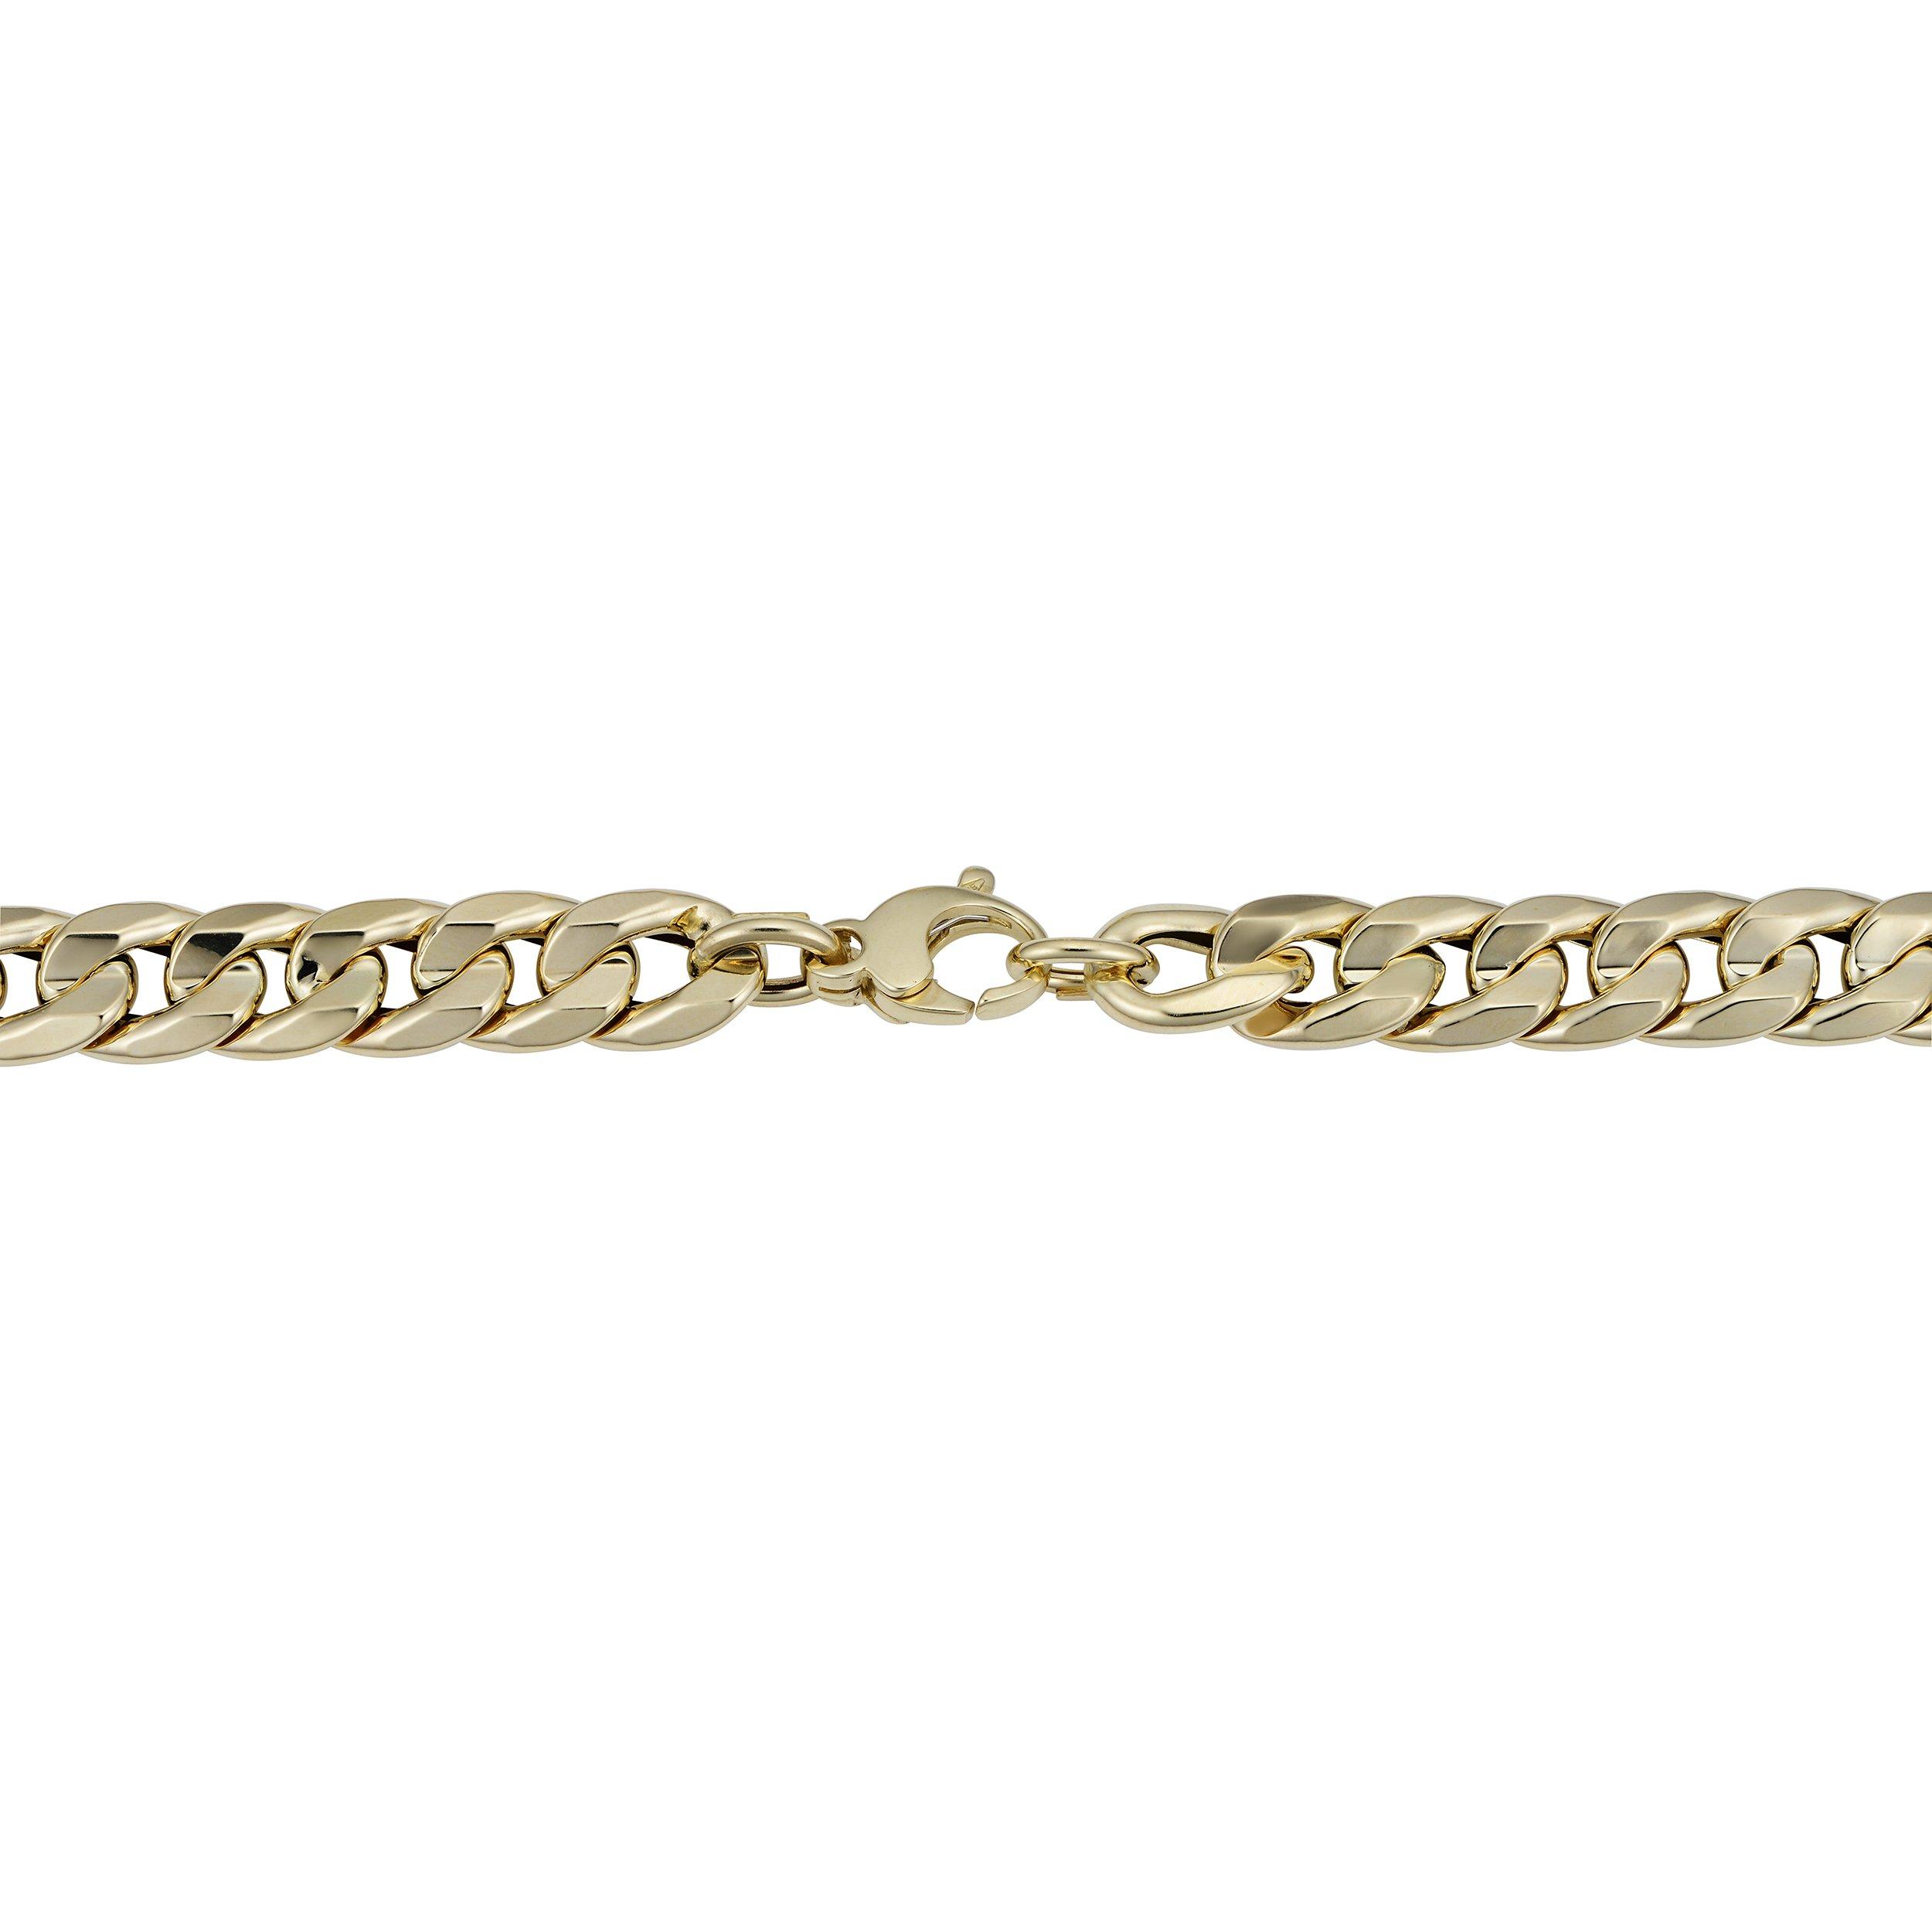 Mens 14k Yellow Gold Cuban Curb Link Bracelet (9.2mm, 8.5 inch) by Kooljewelry (Image #2)